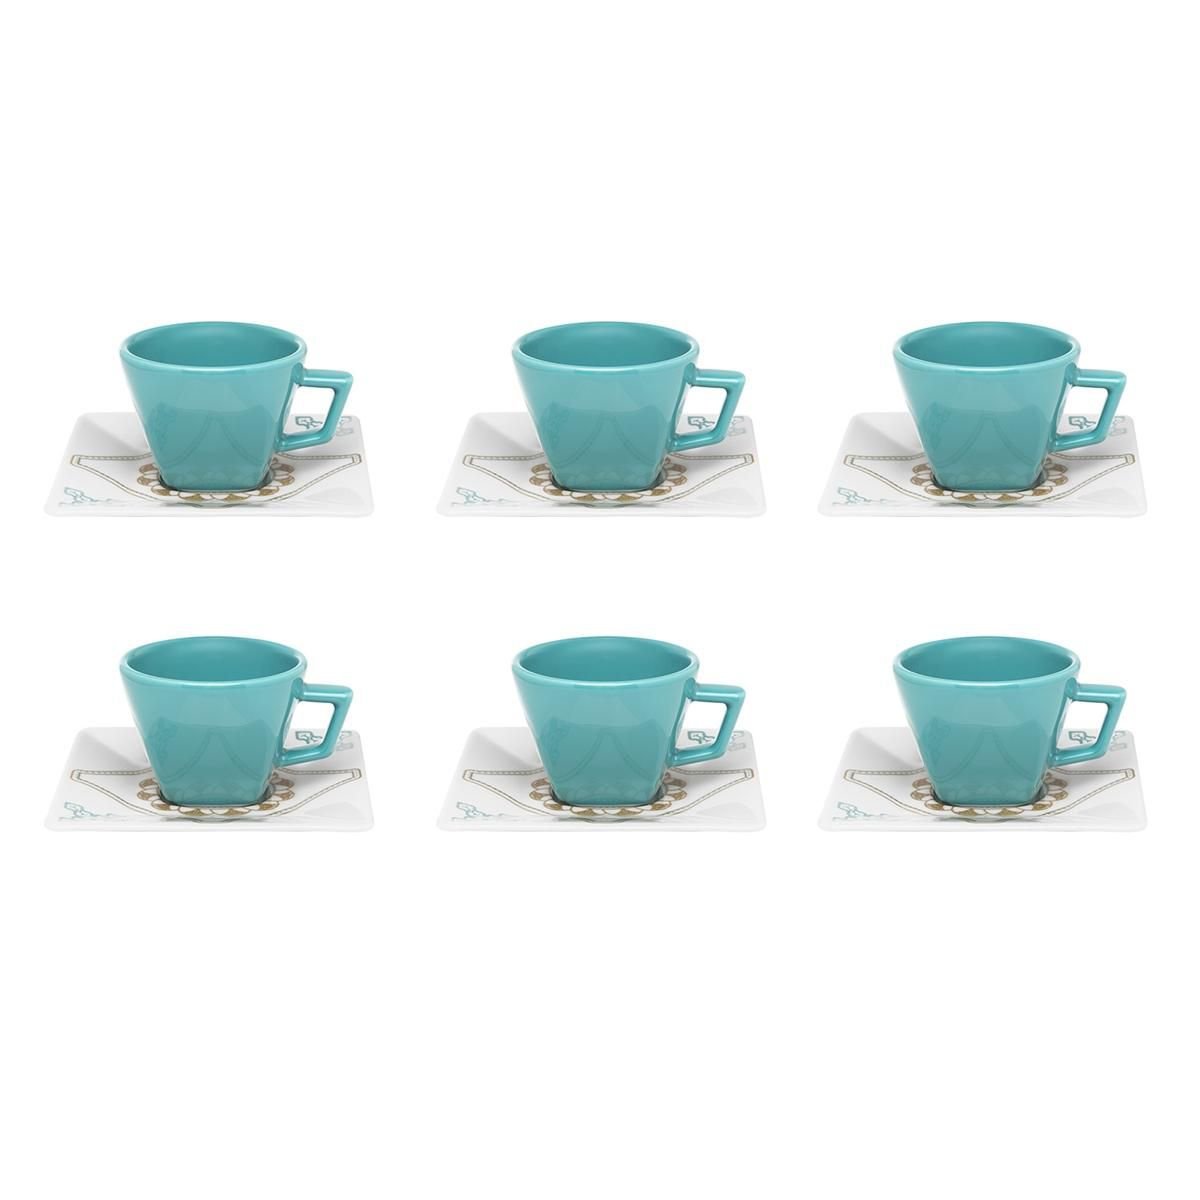 Jogo 6 Xícaras Chá Domo Porcelana - Oxford